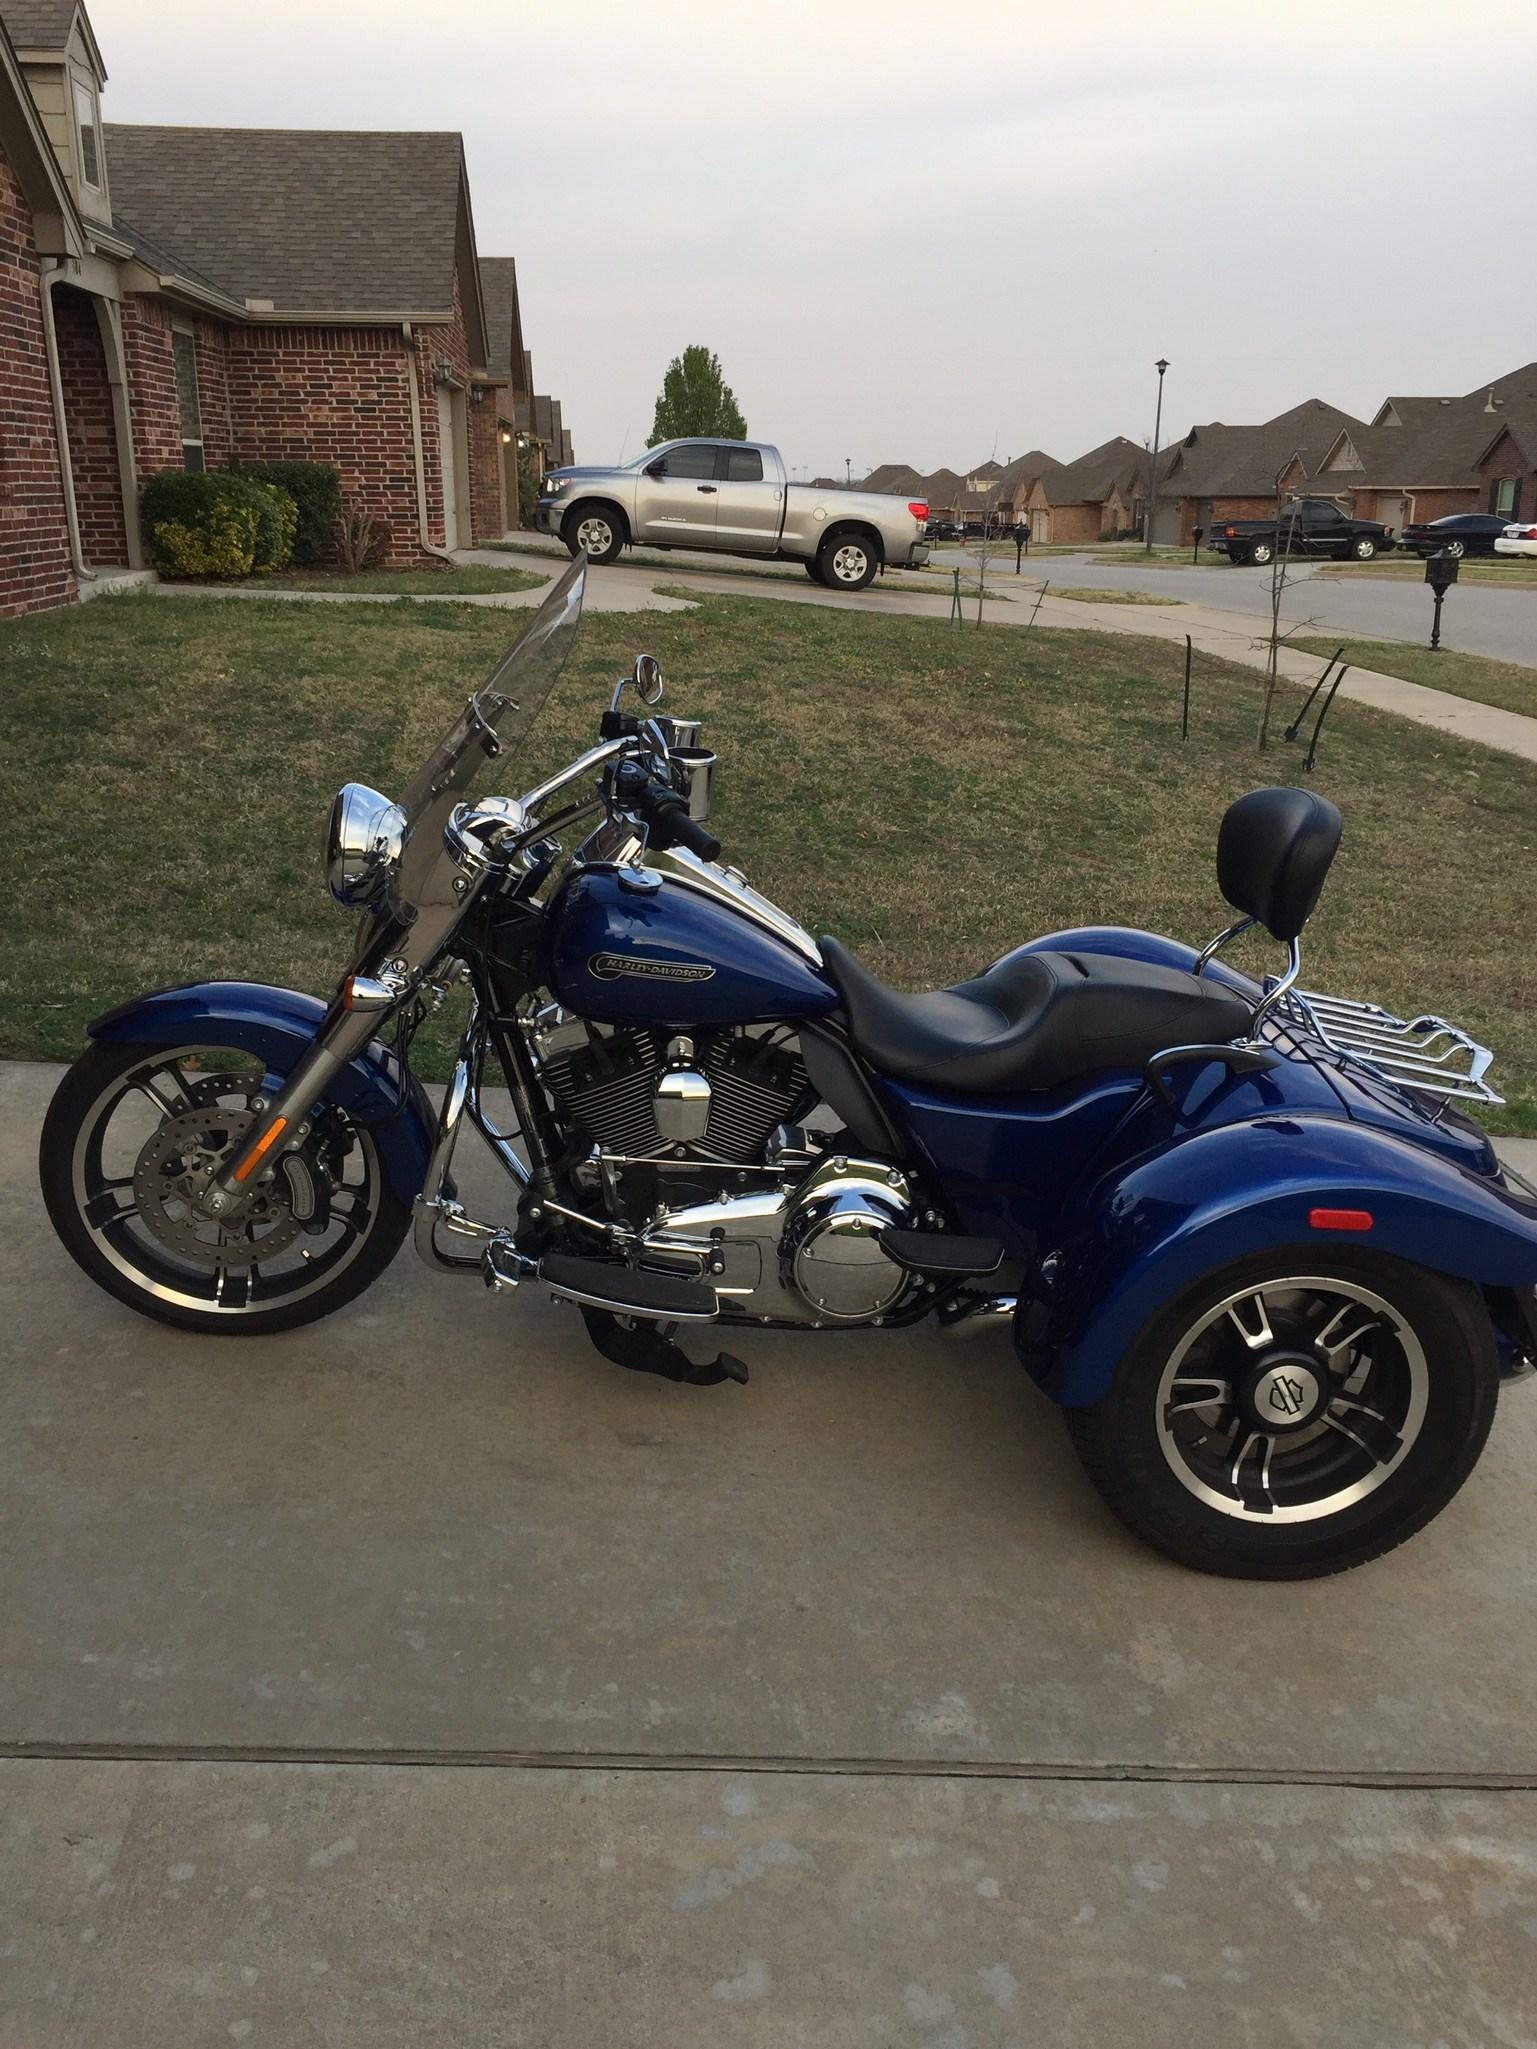 2015 HarleyDavidson FLRT Freewheeler Blue Broken